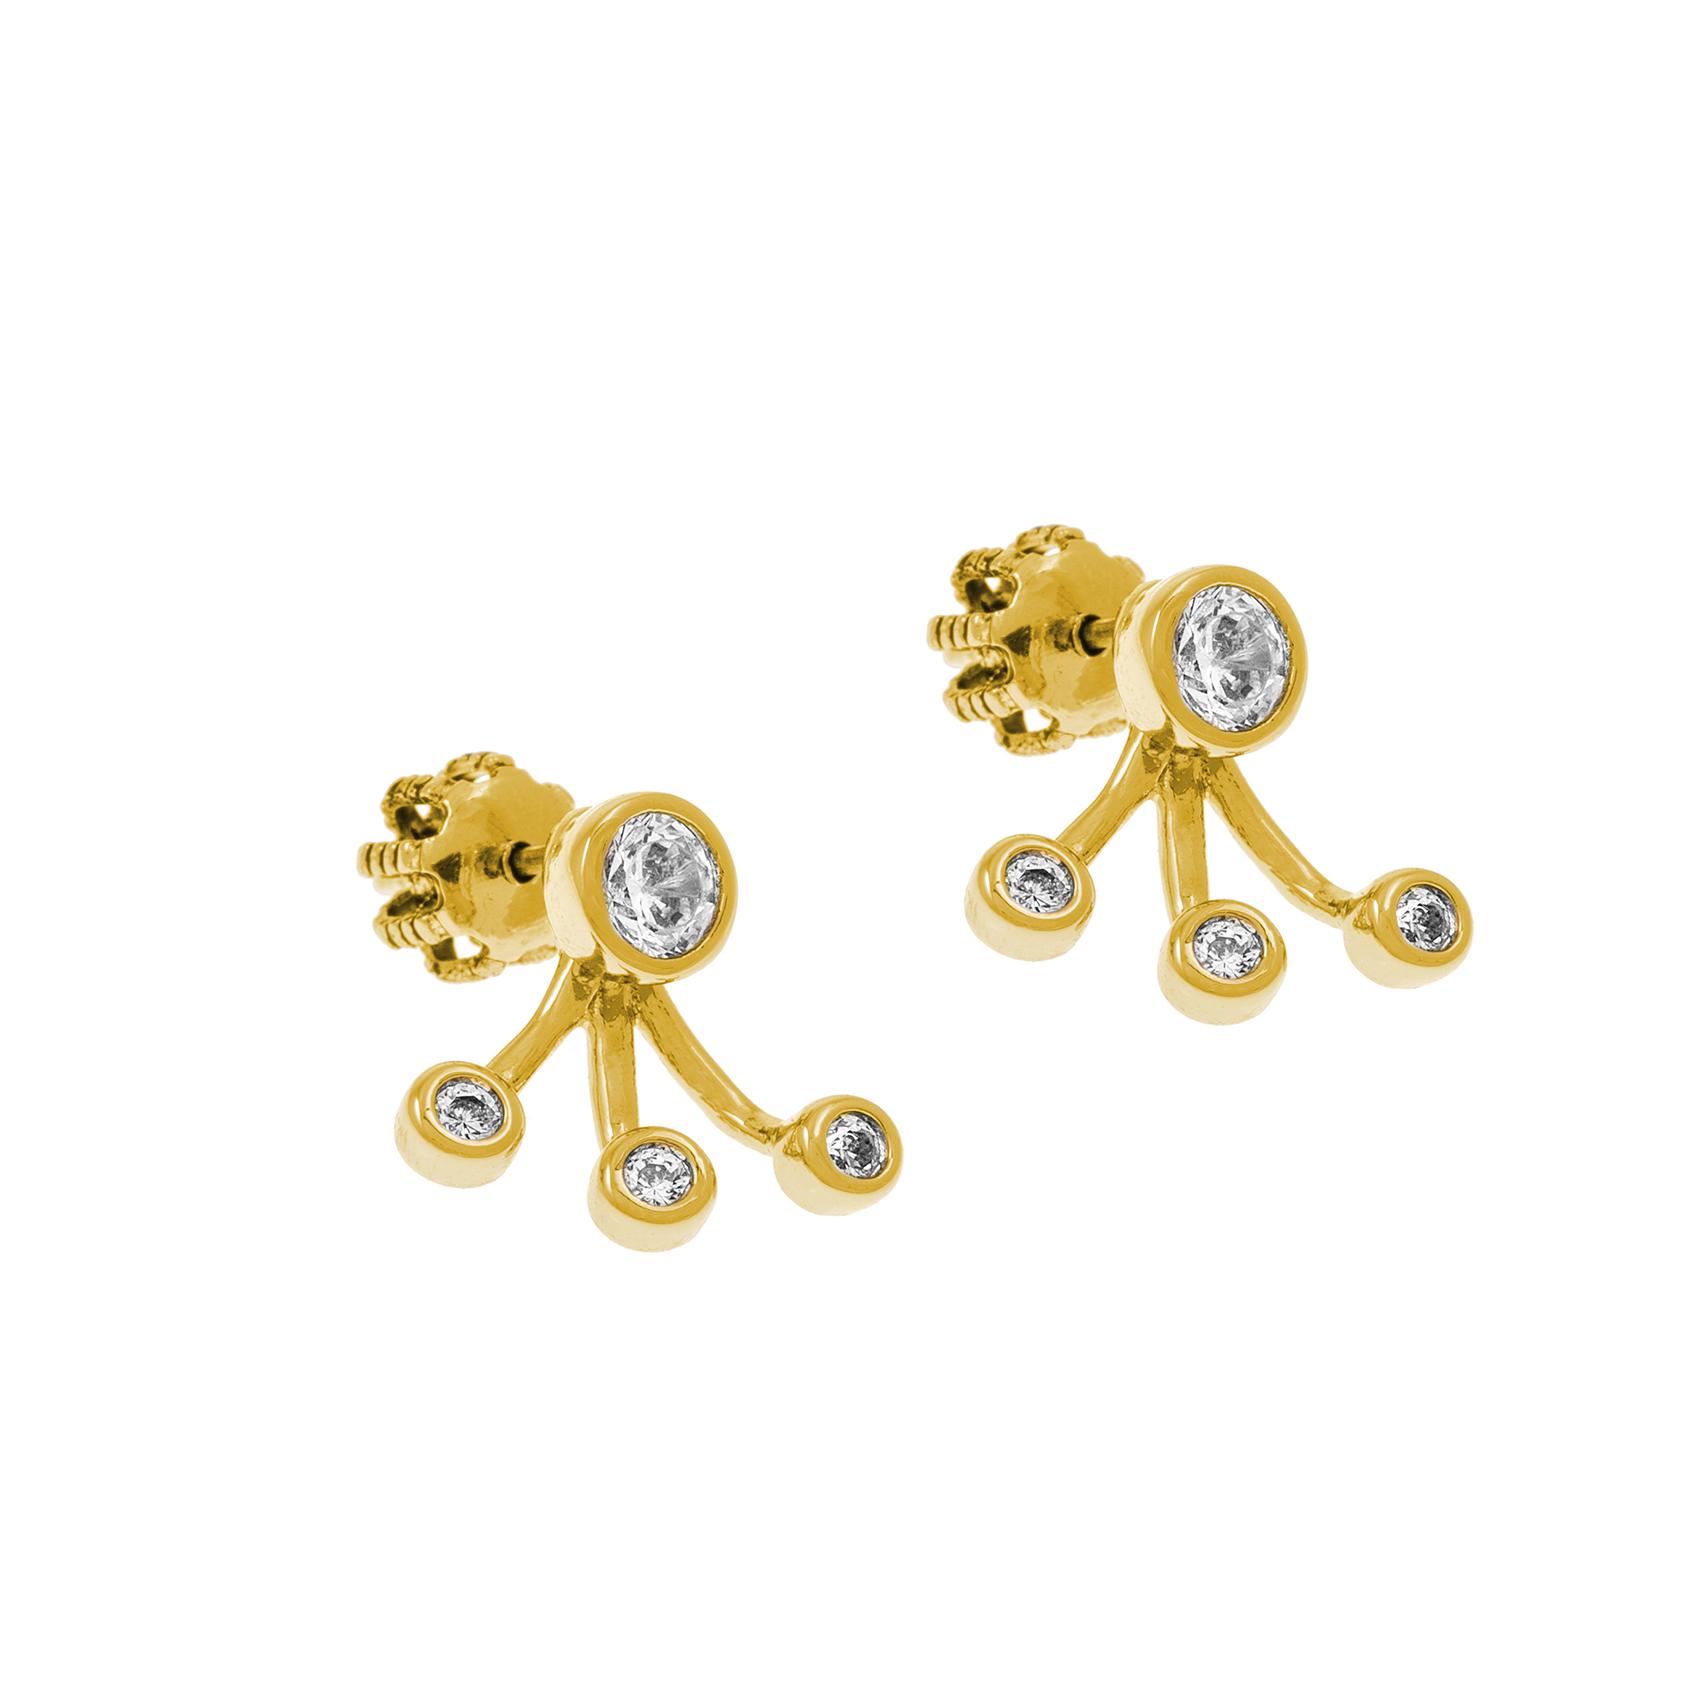 JUICY COUTURE – Γυναικεία σκουλαρίκια JUICY COUTURE χρυσά